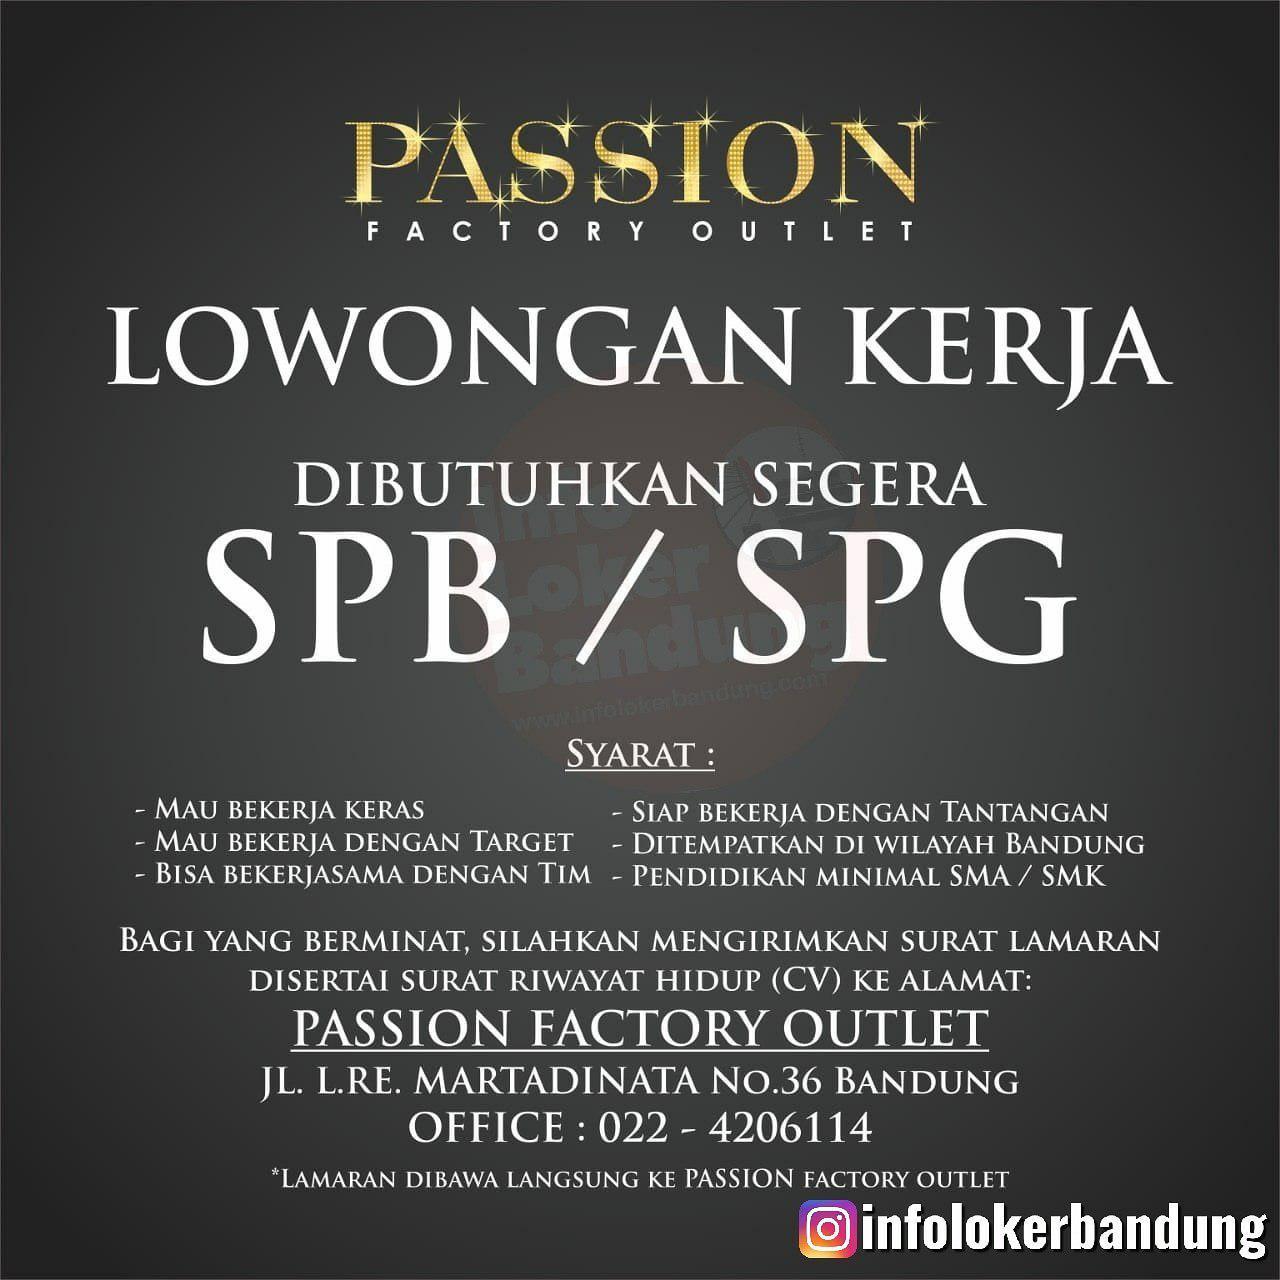 Lowongan Kerja Passion Factory Outlet Bandung Agustus 2019